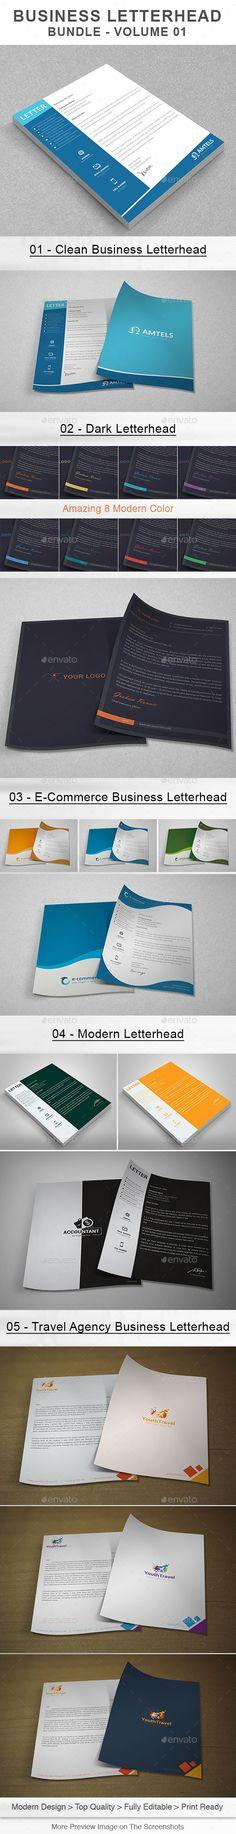 Business Letterhead Bundle | Volume 01